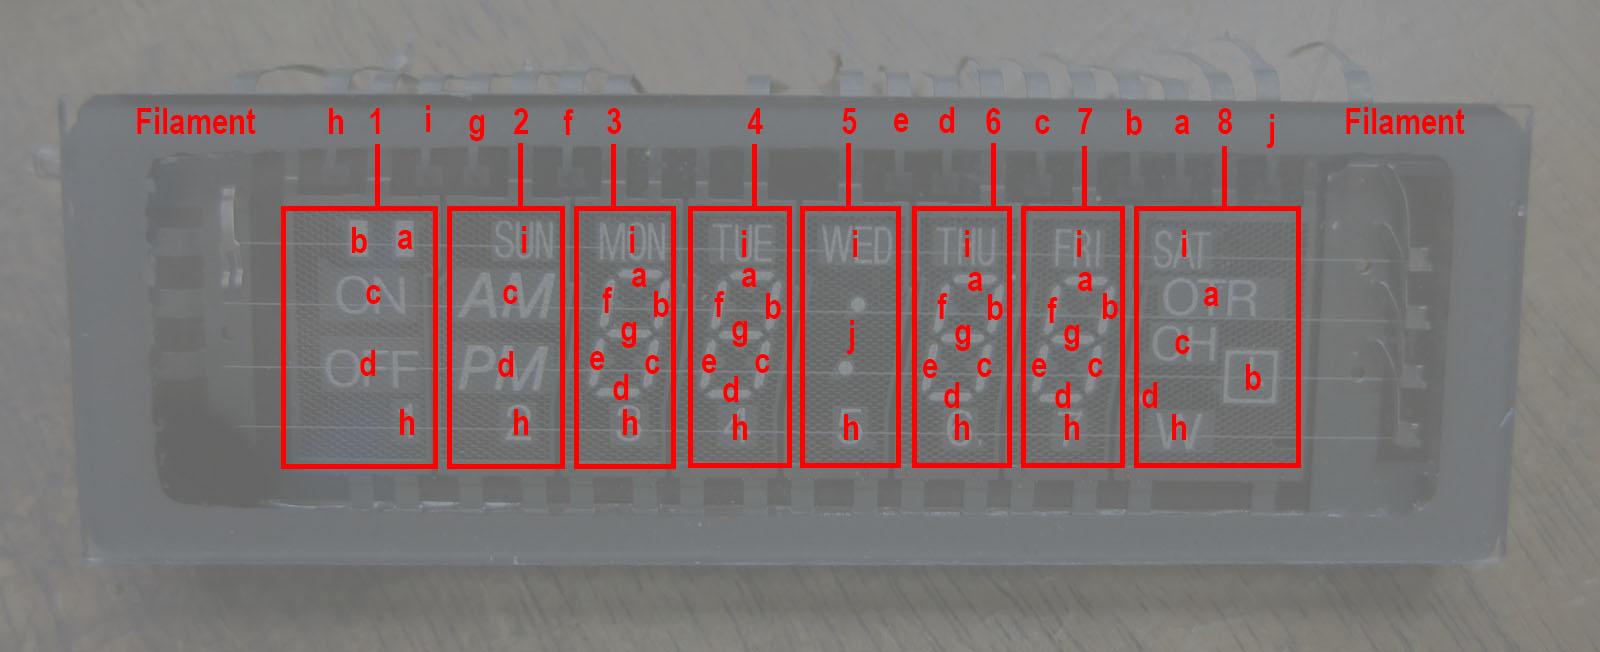 NEC VSL0010-A VFD Annotated